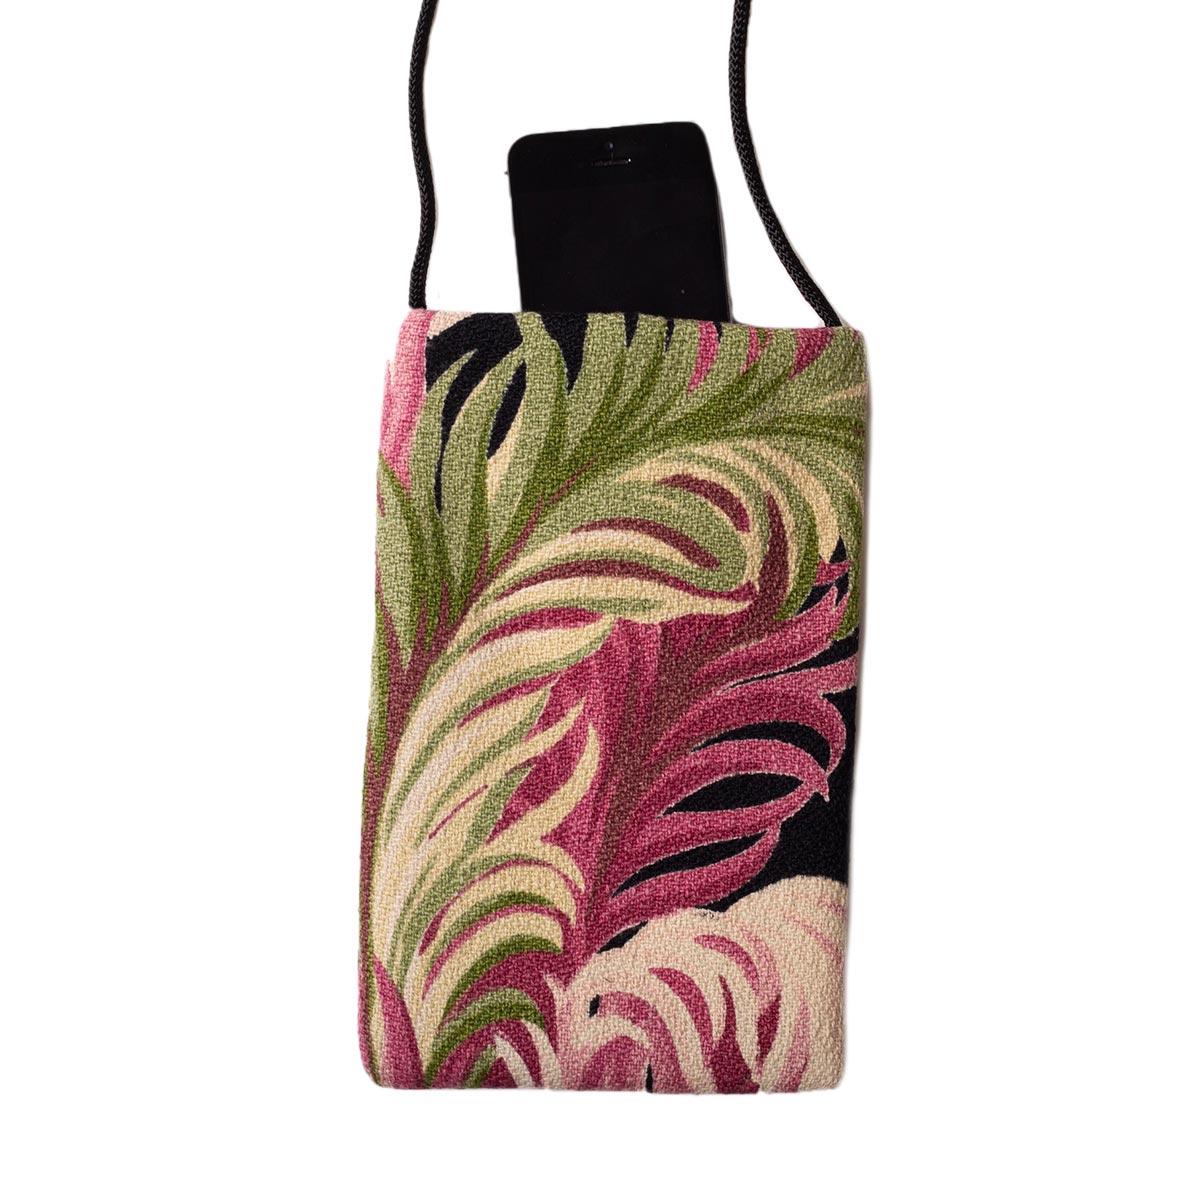 Cell Phone bag Ferns on Black I